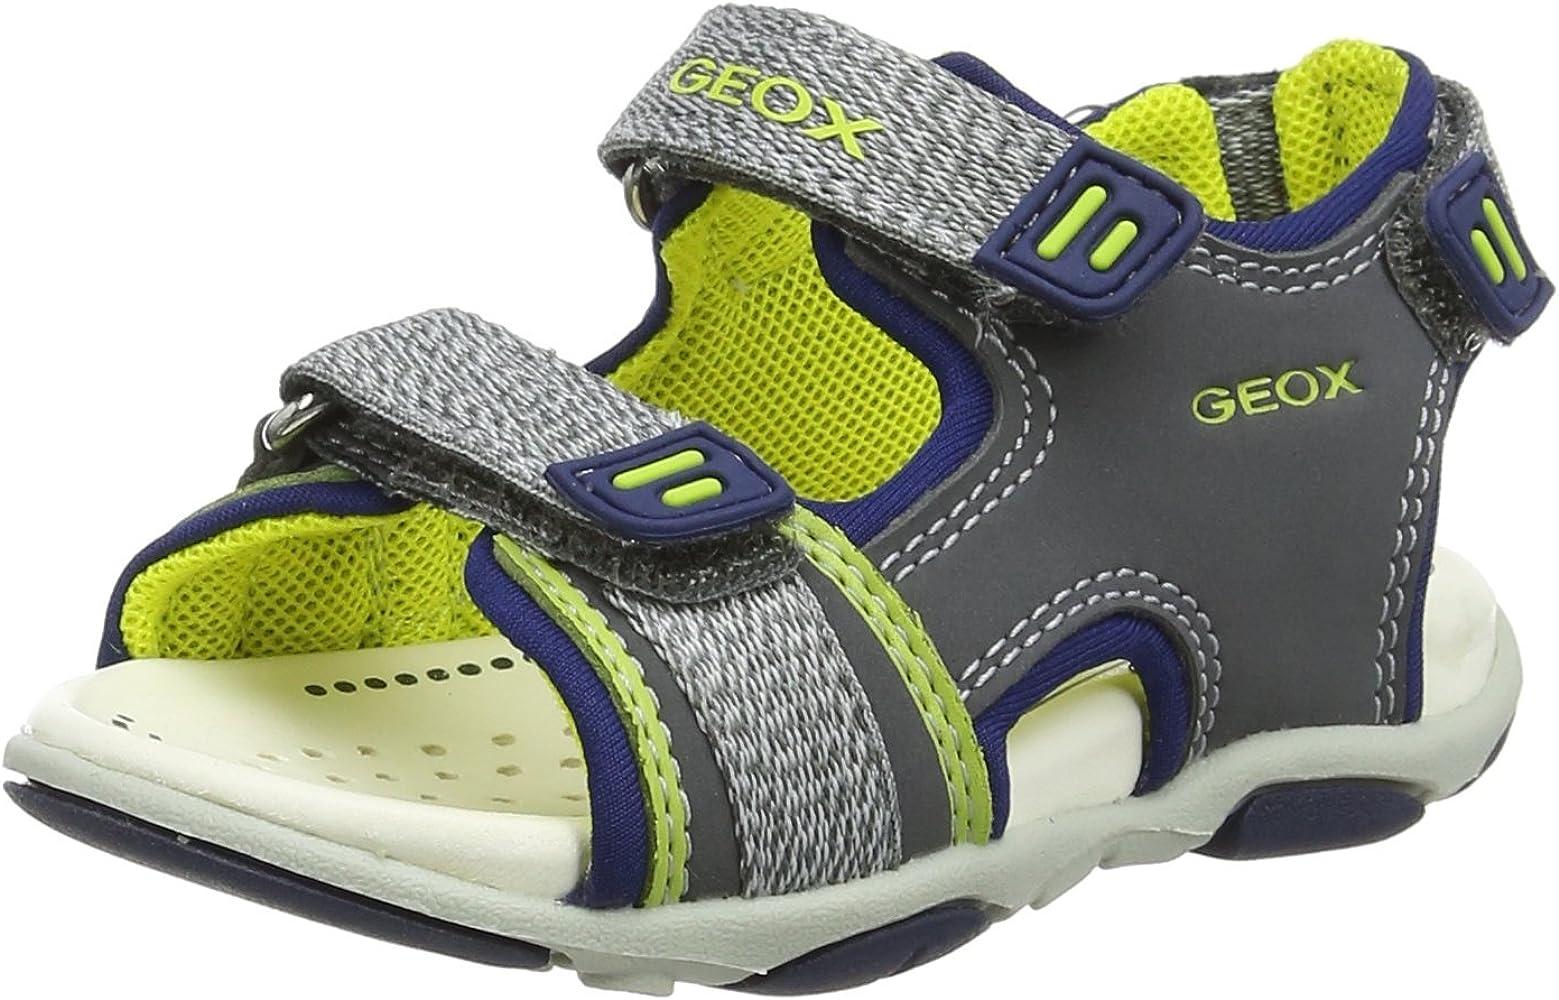 Geox B Sandal AGASIM BOY GreyLime: Amazon.ca: Shoes & Handbags